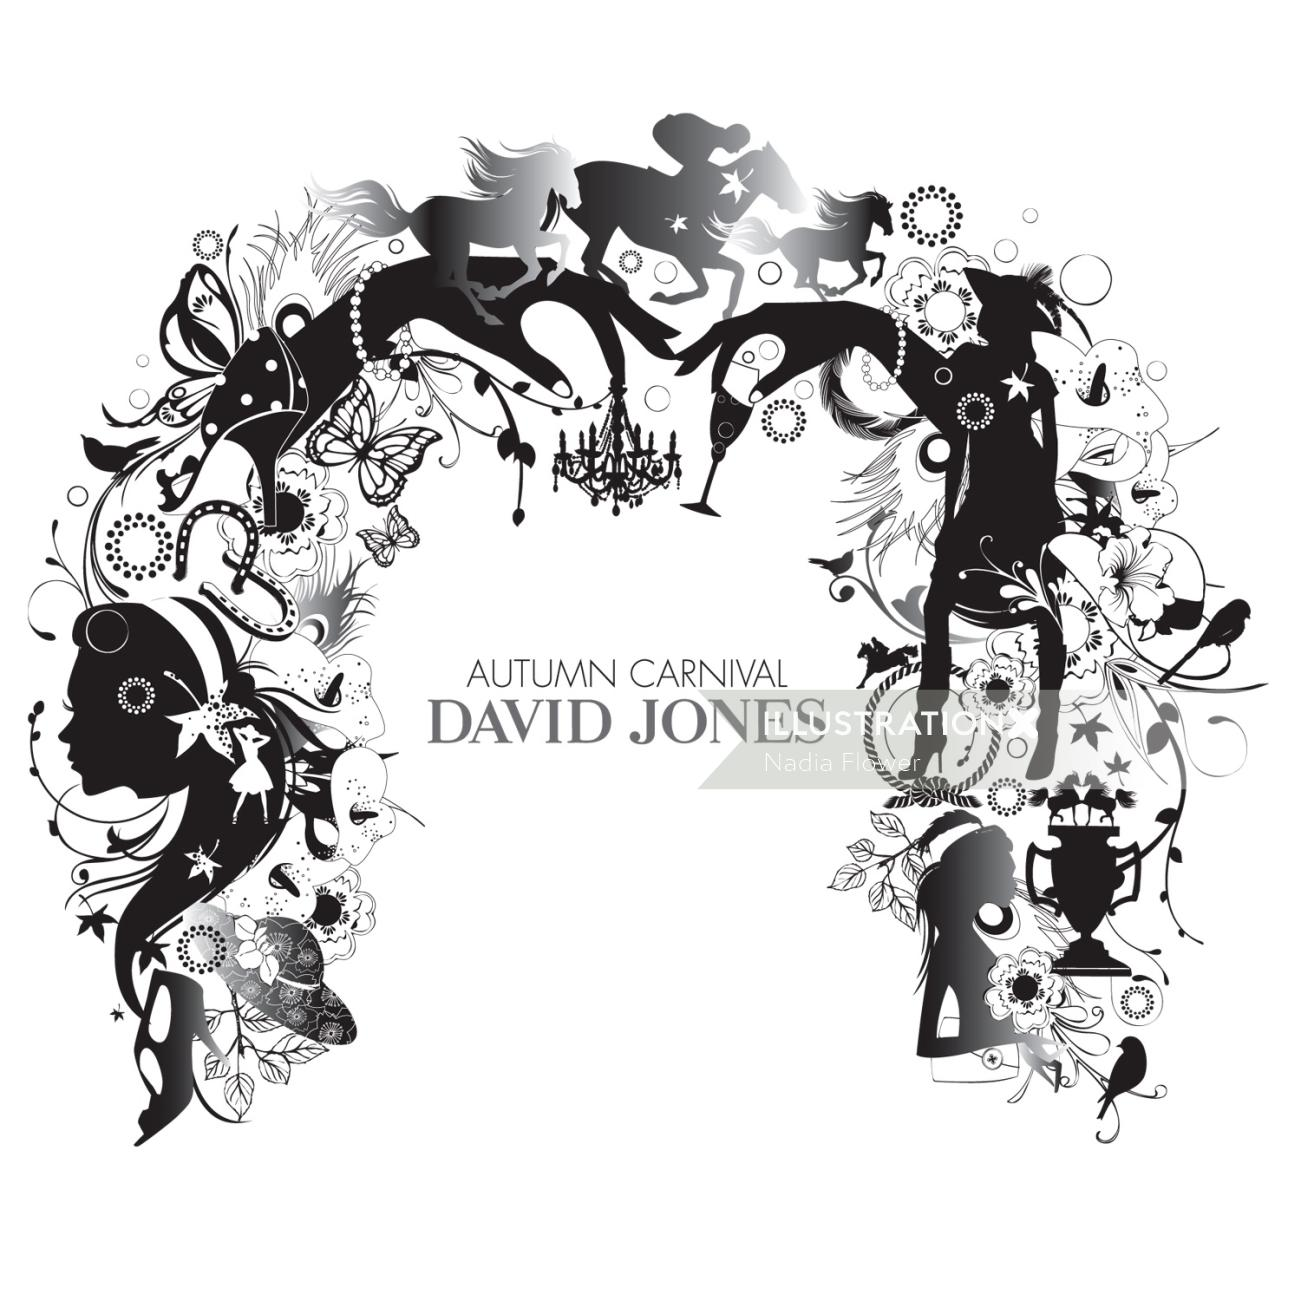 Surreal illustration of david jones sign board